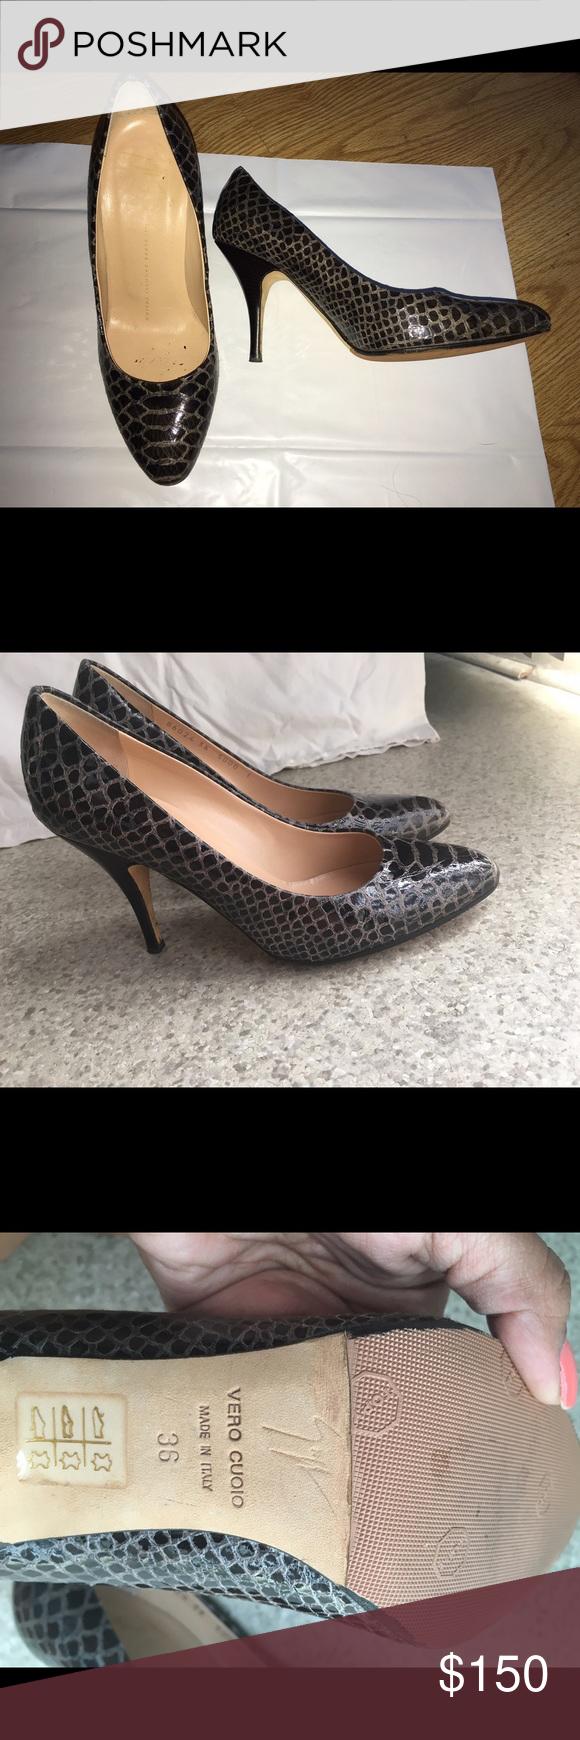 "Giuseppe Zanotti Design pumps Size 6 Giuseppe Zanotti Design pumps Size 6. 100% authentic.    I had a professional add ""non slippery soles"". Please view pictures"" Giuseppe Zanotti Shoes Heels"